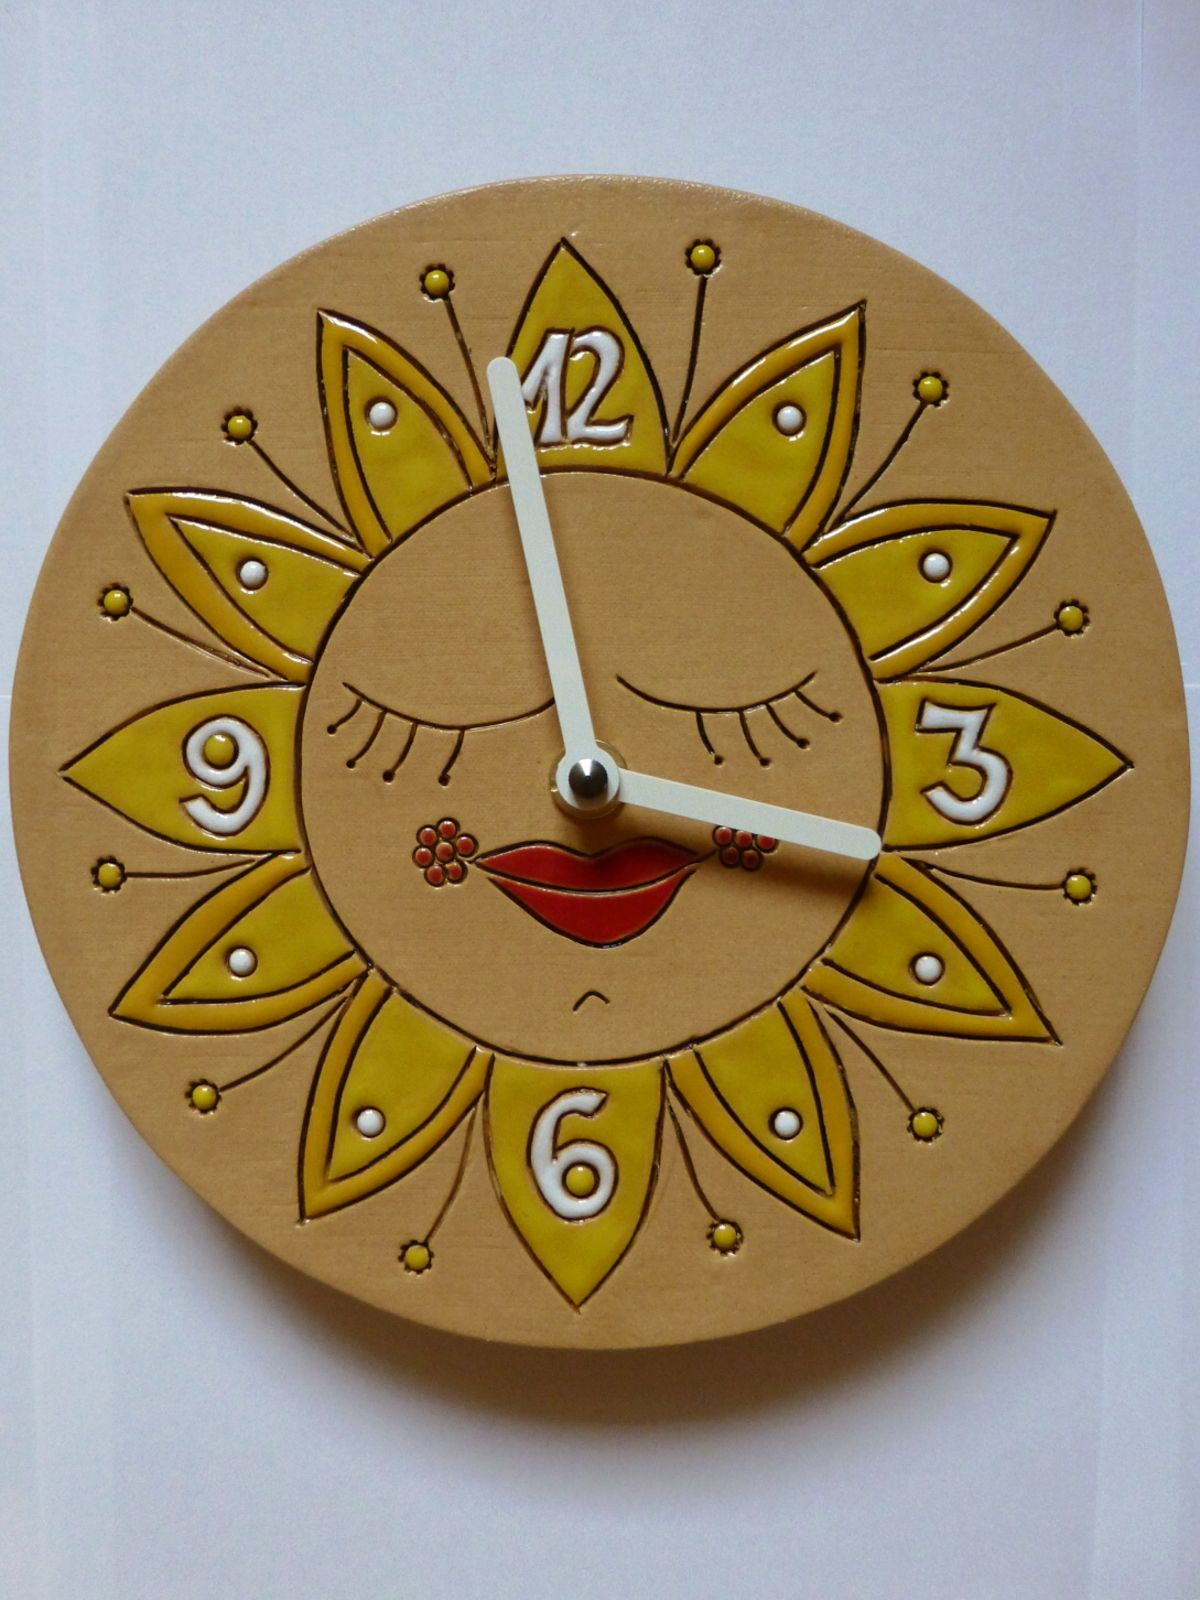 autorské hodiny Designové keramické hodiny na zeď - motiv slunce keramické hodiny sluníčko 2